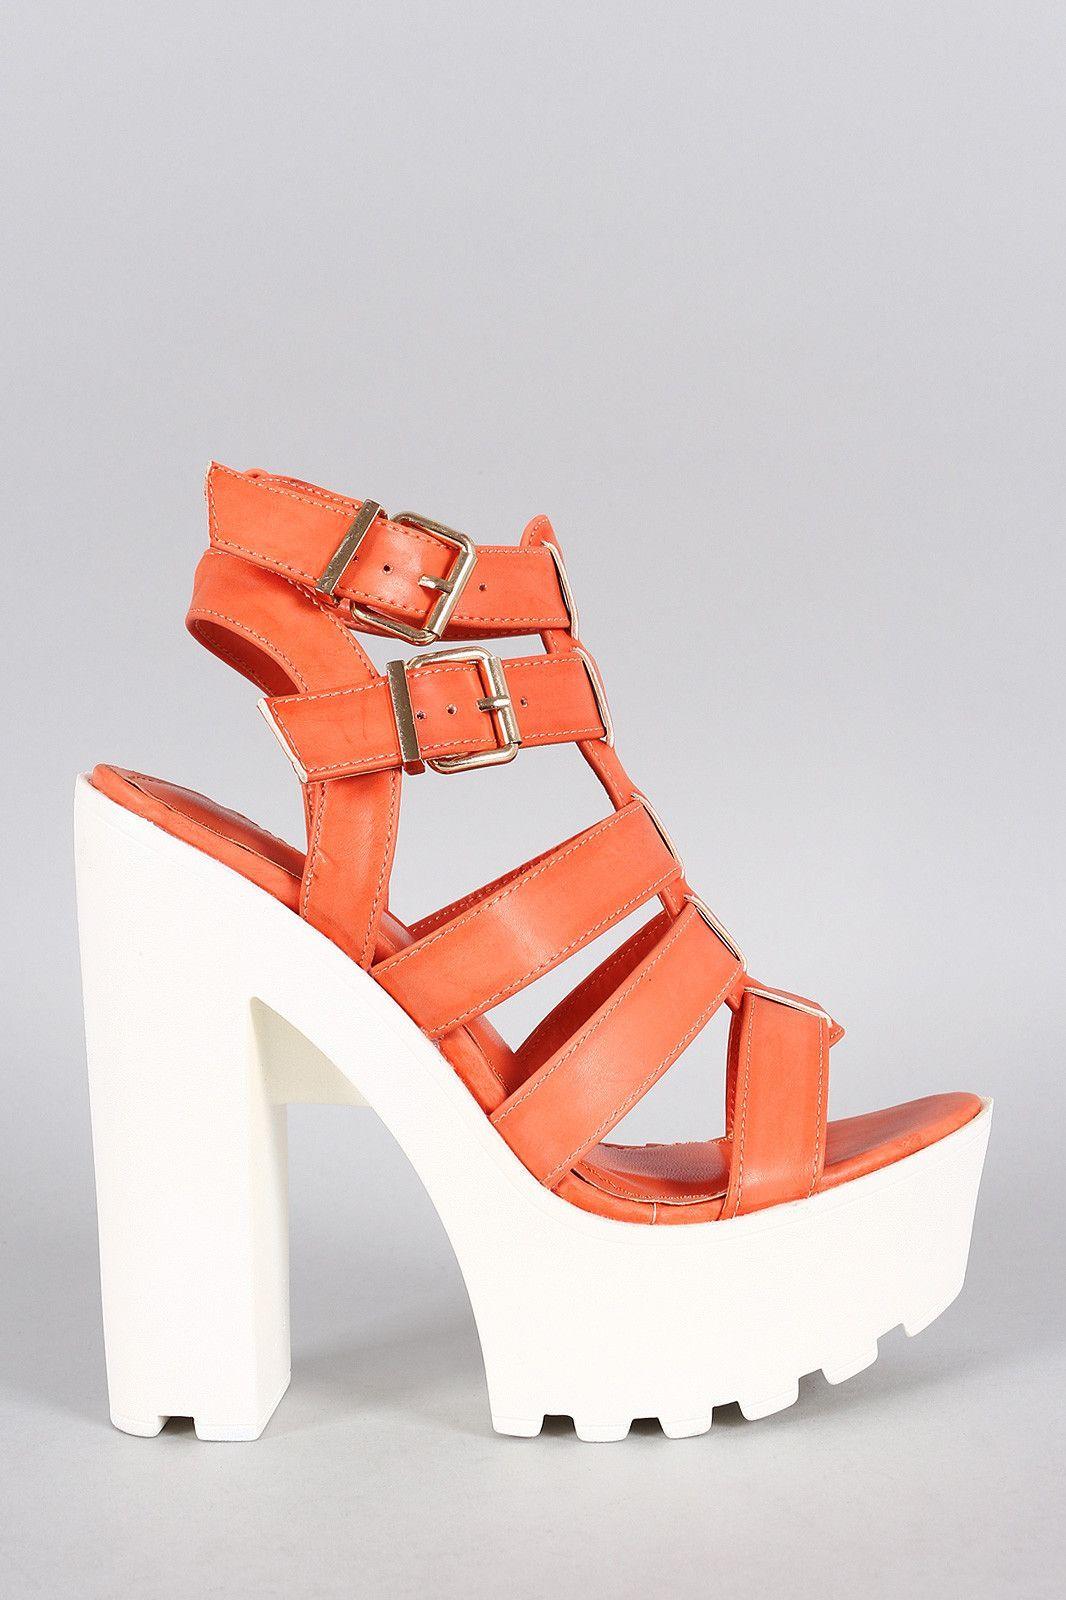 Shoe Republic Two-Tone Cage Lug Sole Platform Heel